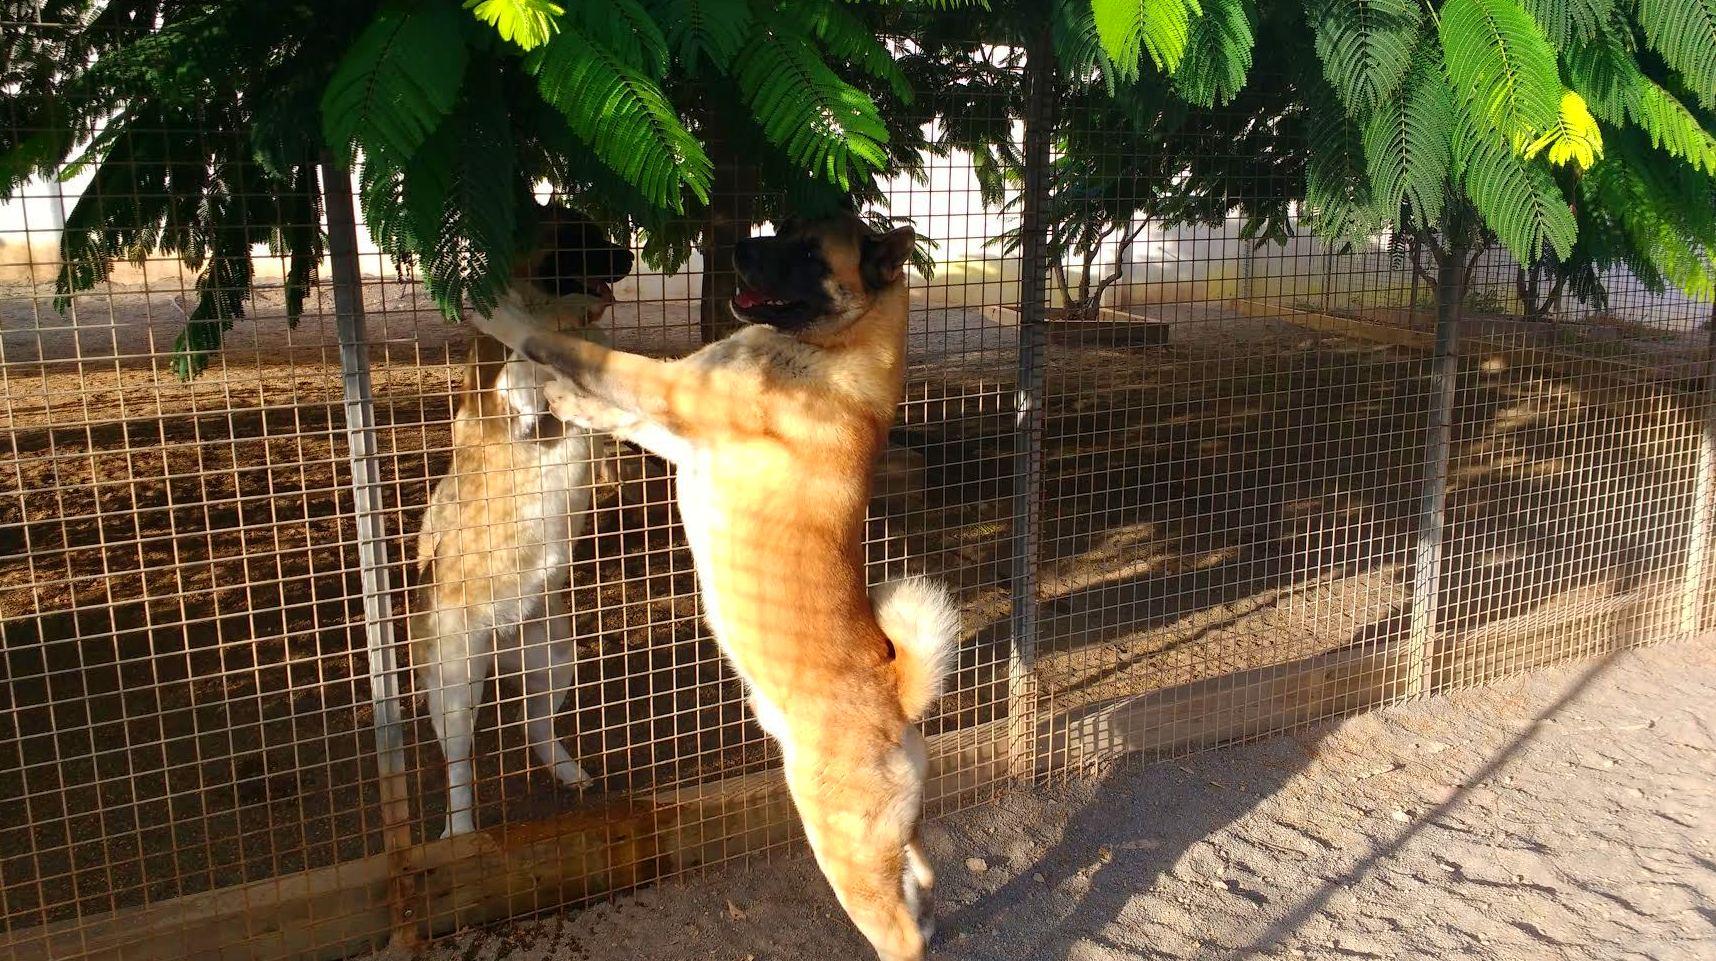 Modificacion de conducta canina Las Palmas de Gran Canaria